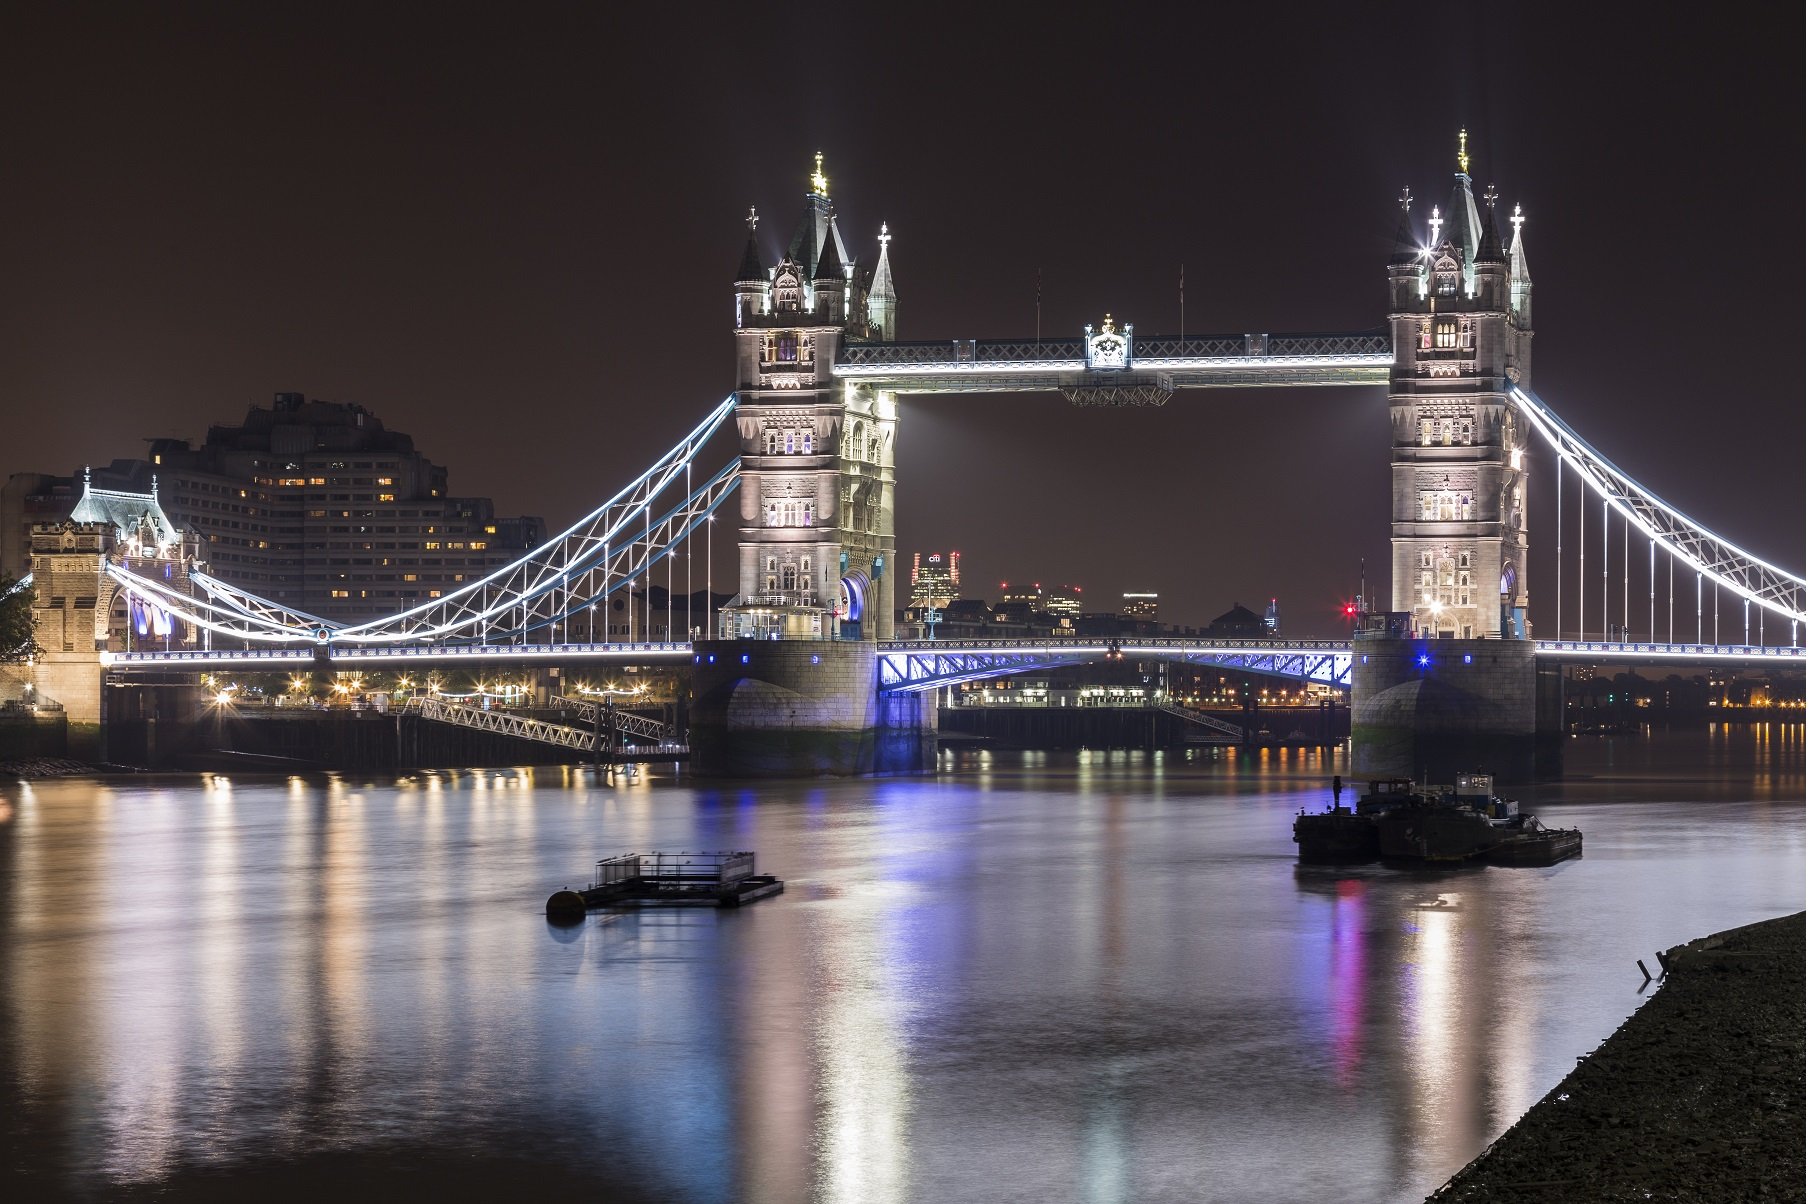 Londra: Tower bridge e Tamigi...